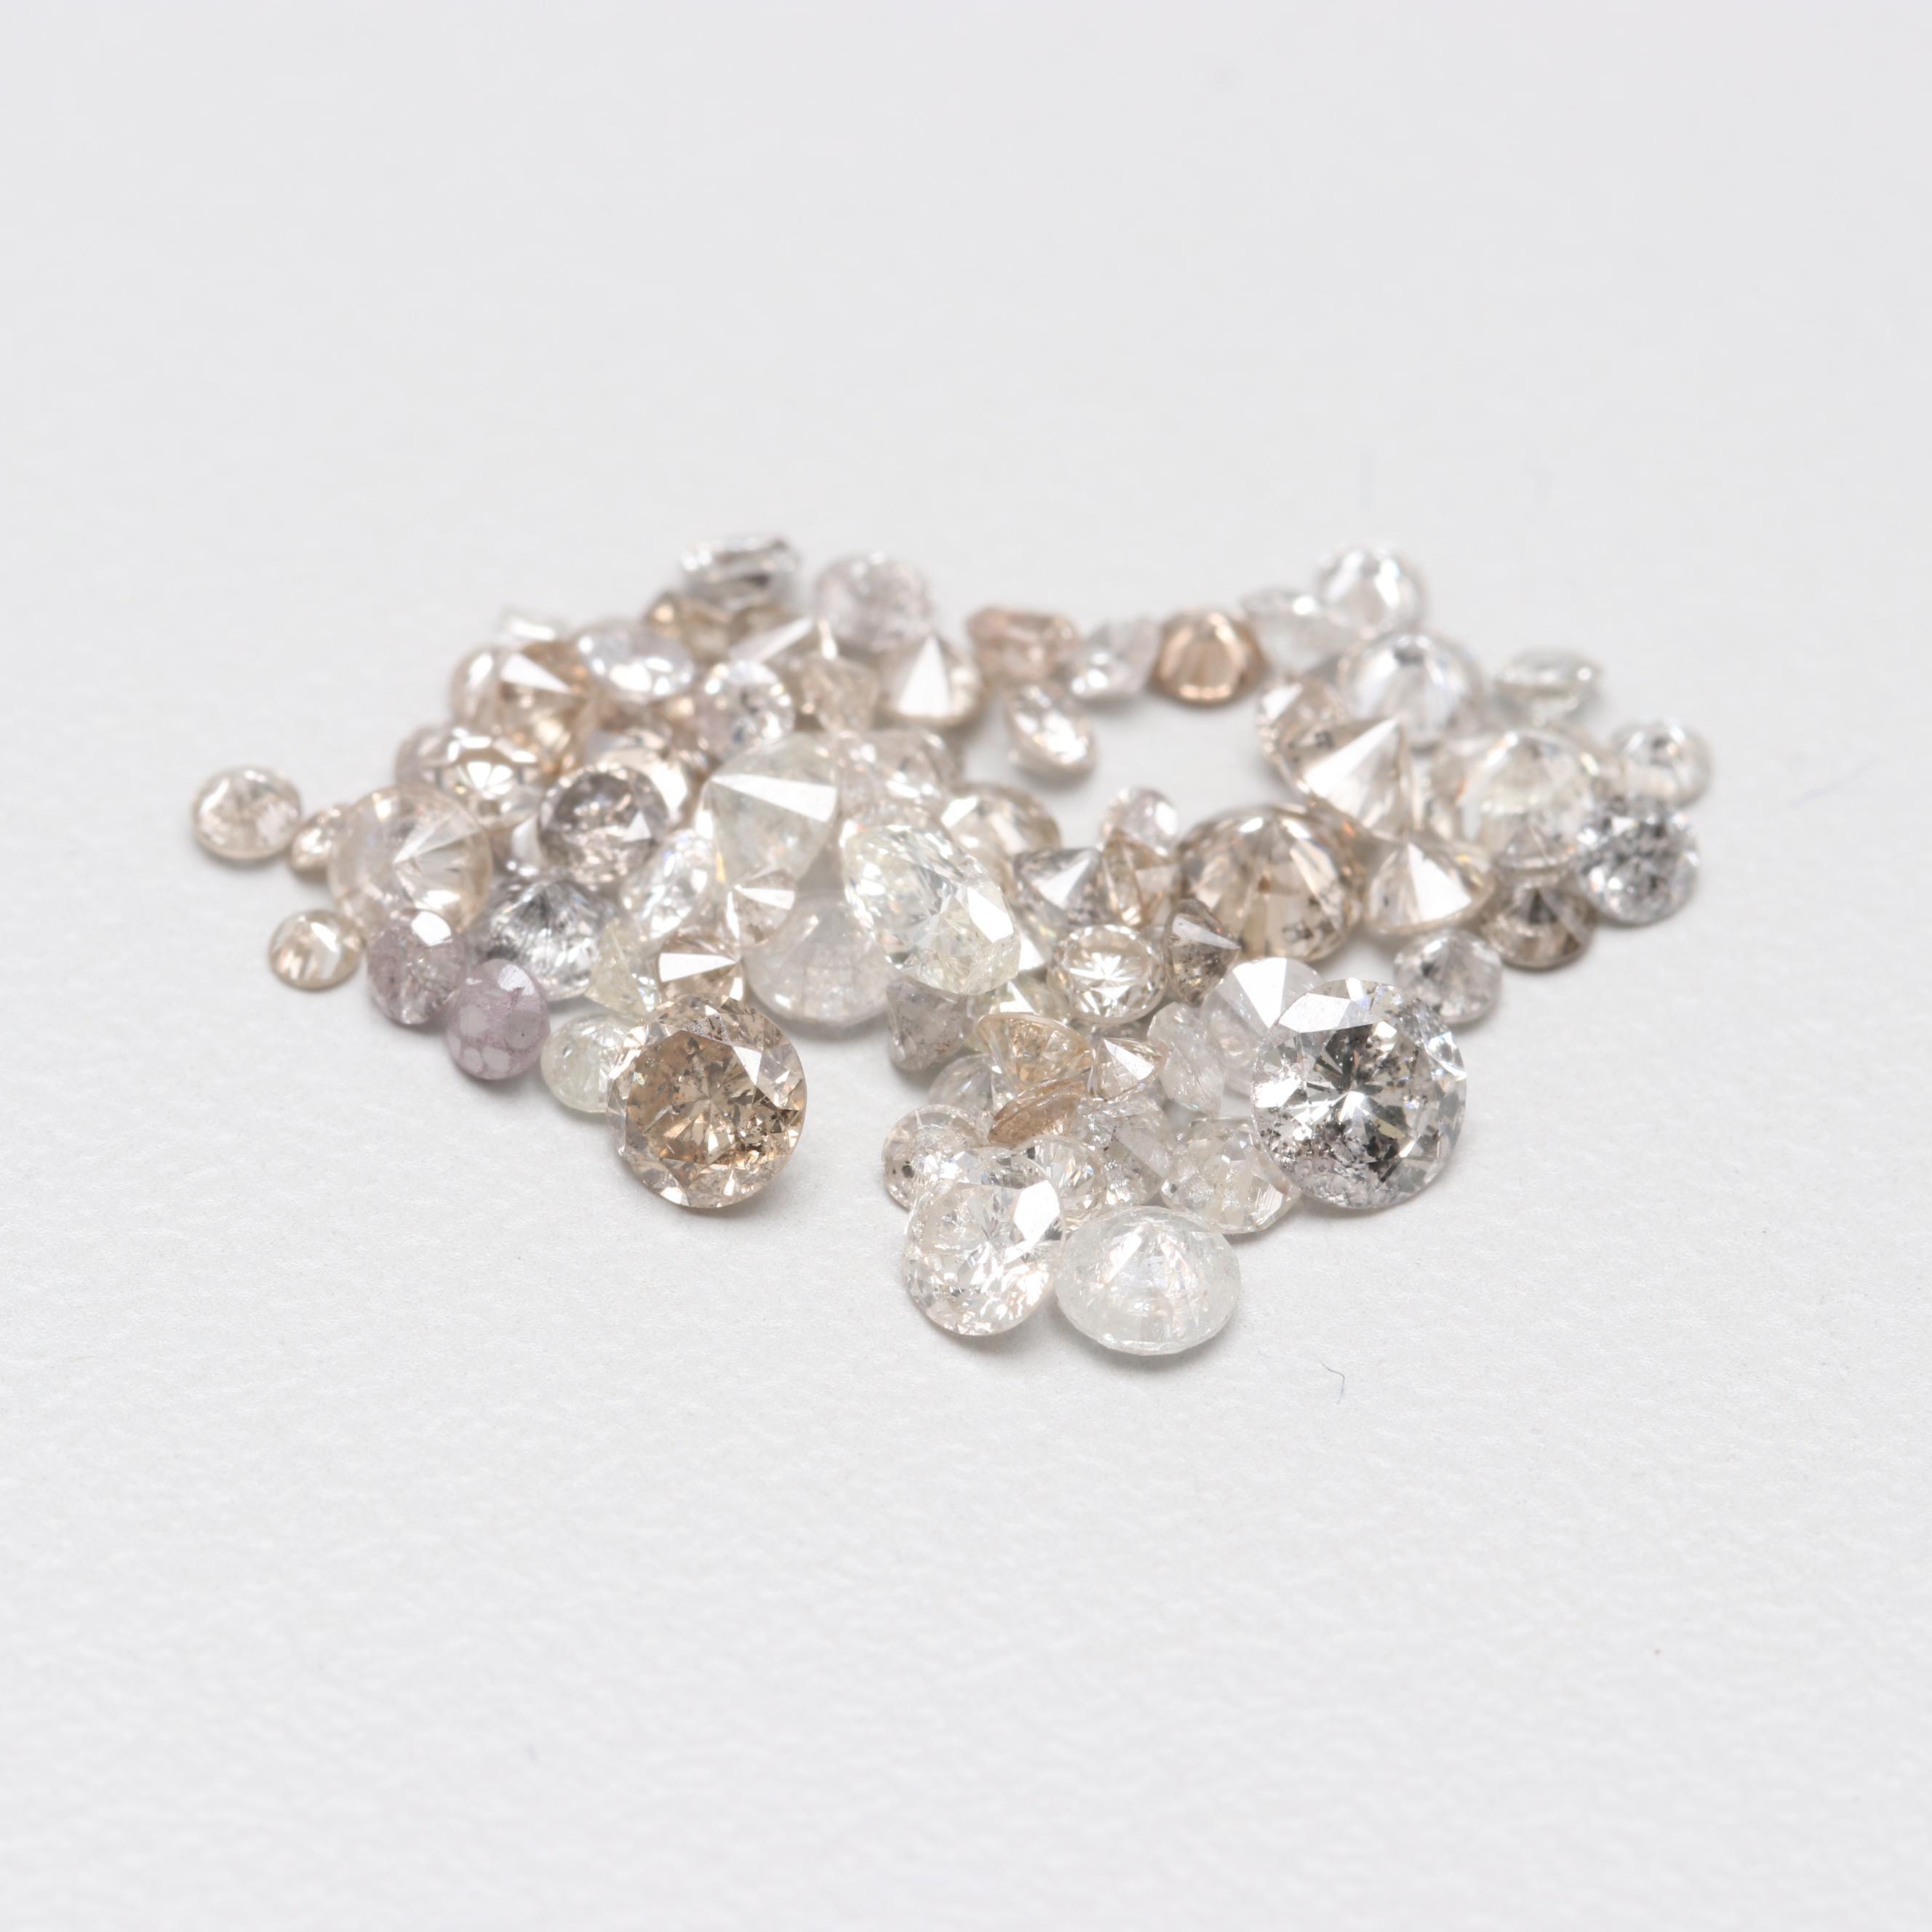 Loose 2.70 CTW Diamond Assortment